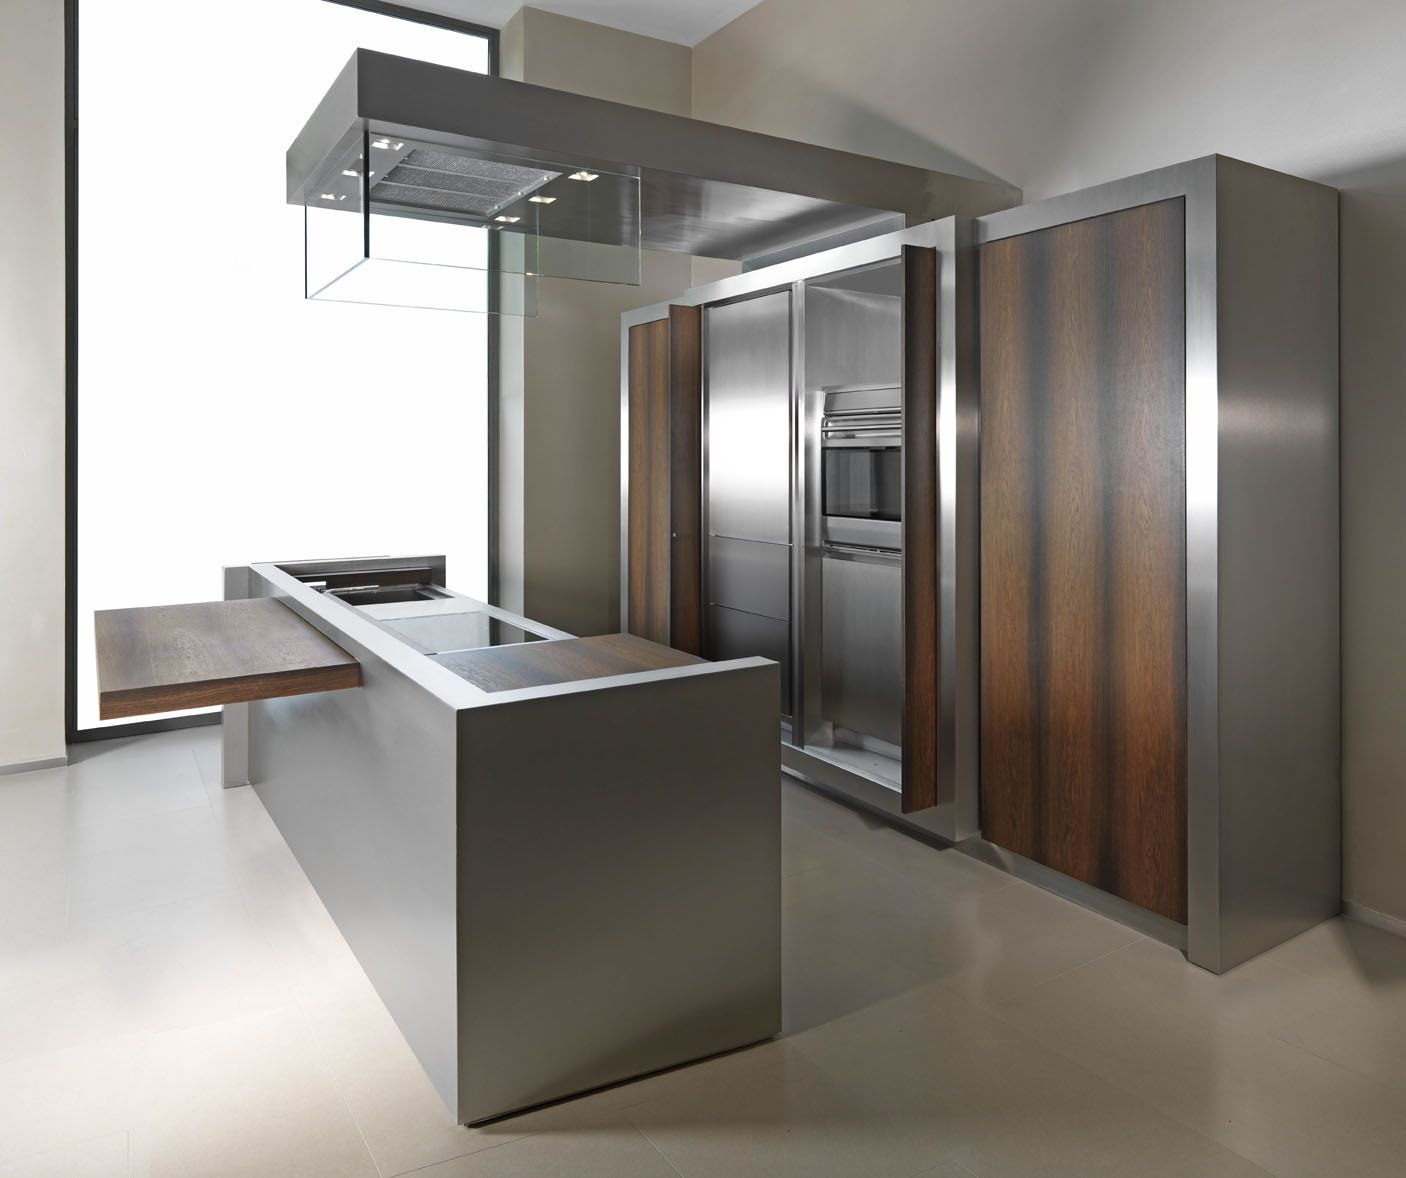 Best Images Steel Kitchen Cabinets Ideas